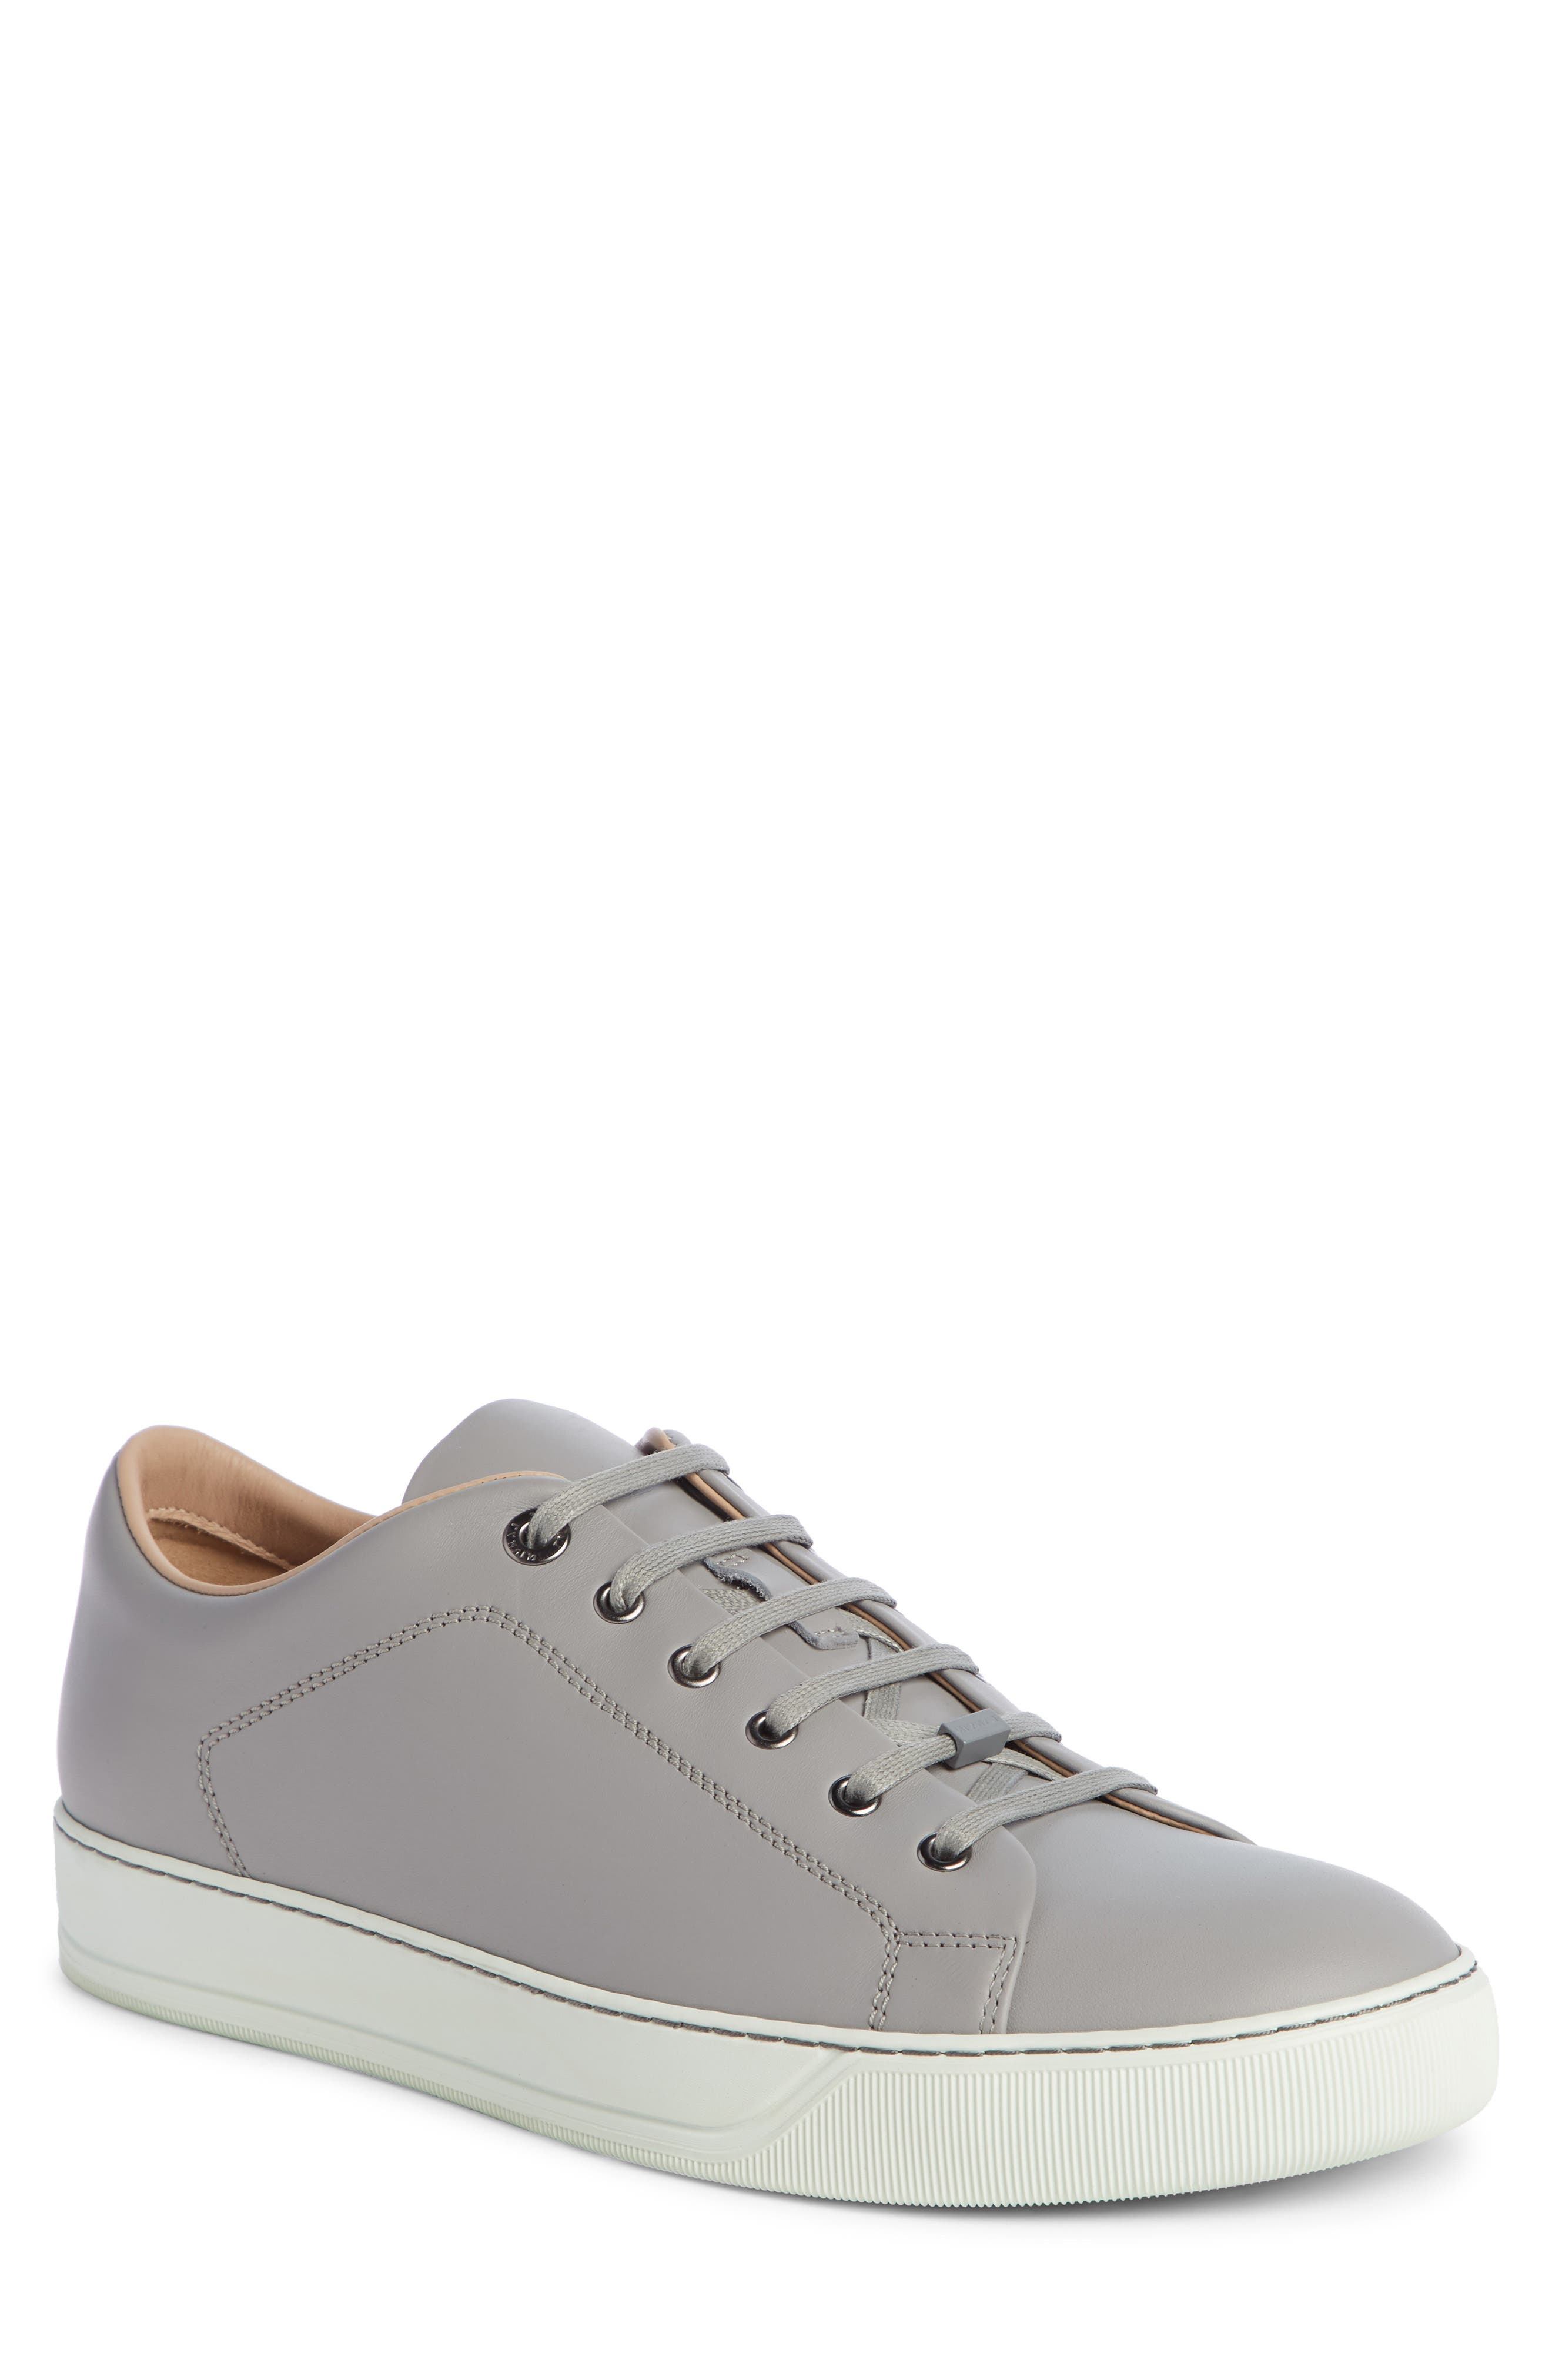 Frye Nappa Sneaker,                         Main,                         color, 022